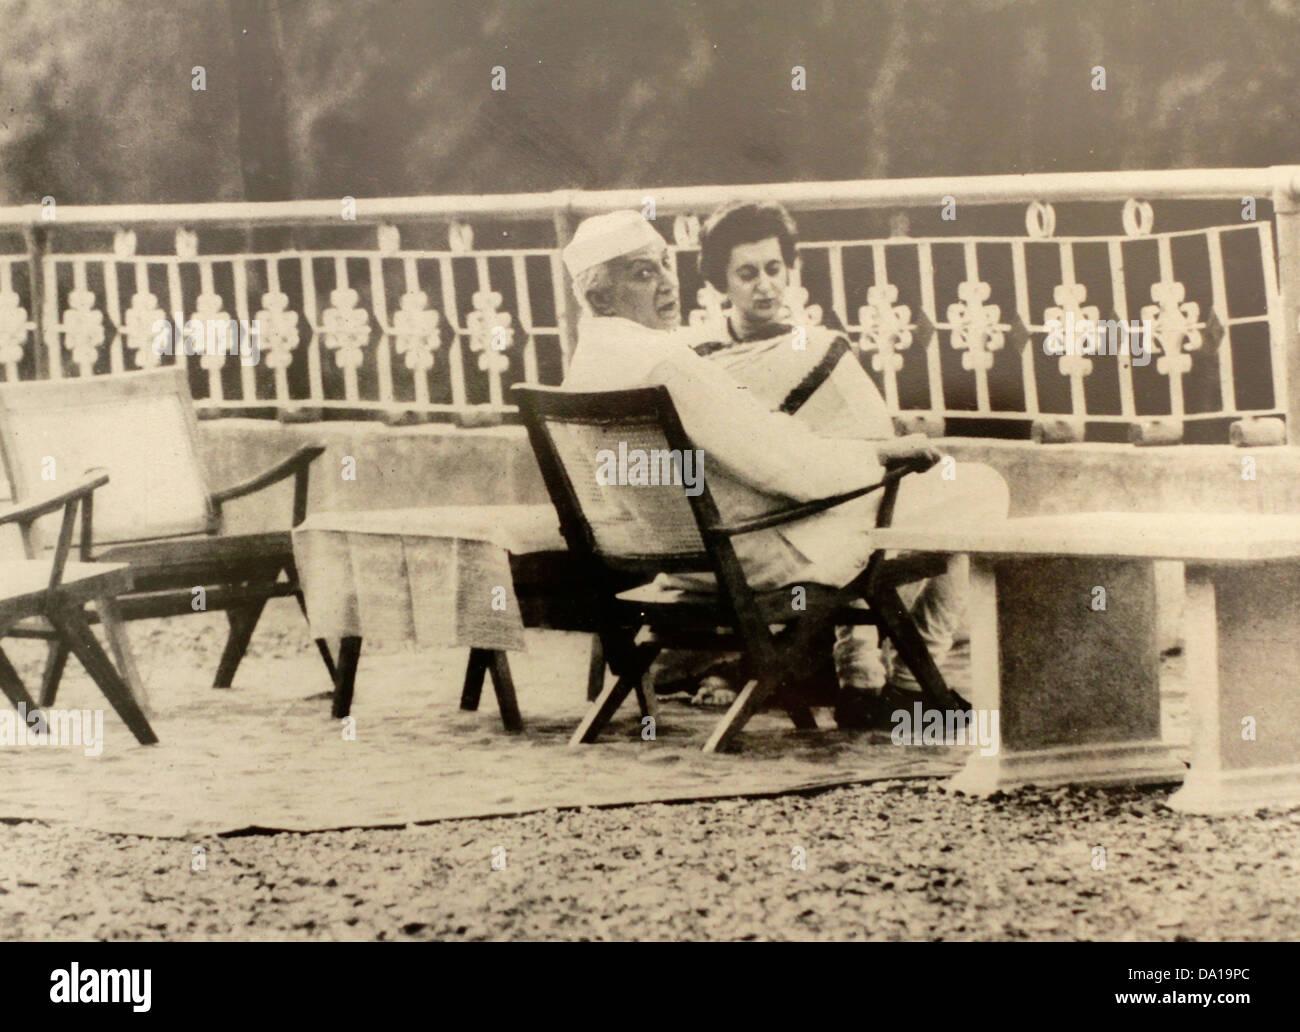 Jawaharlal nehru and Indira Gandhi at Dehradun, May 26, 1964 - Stock Image